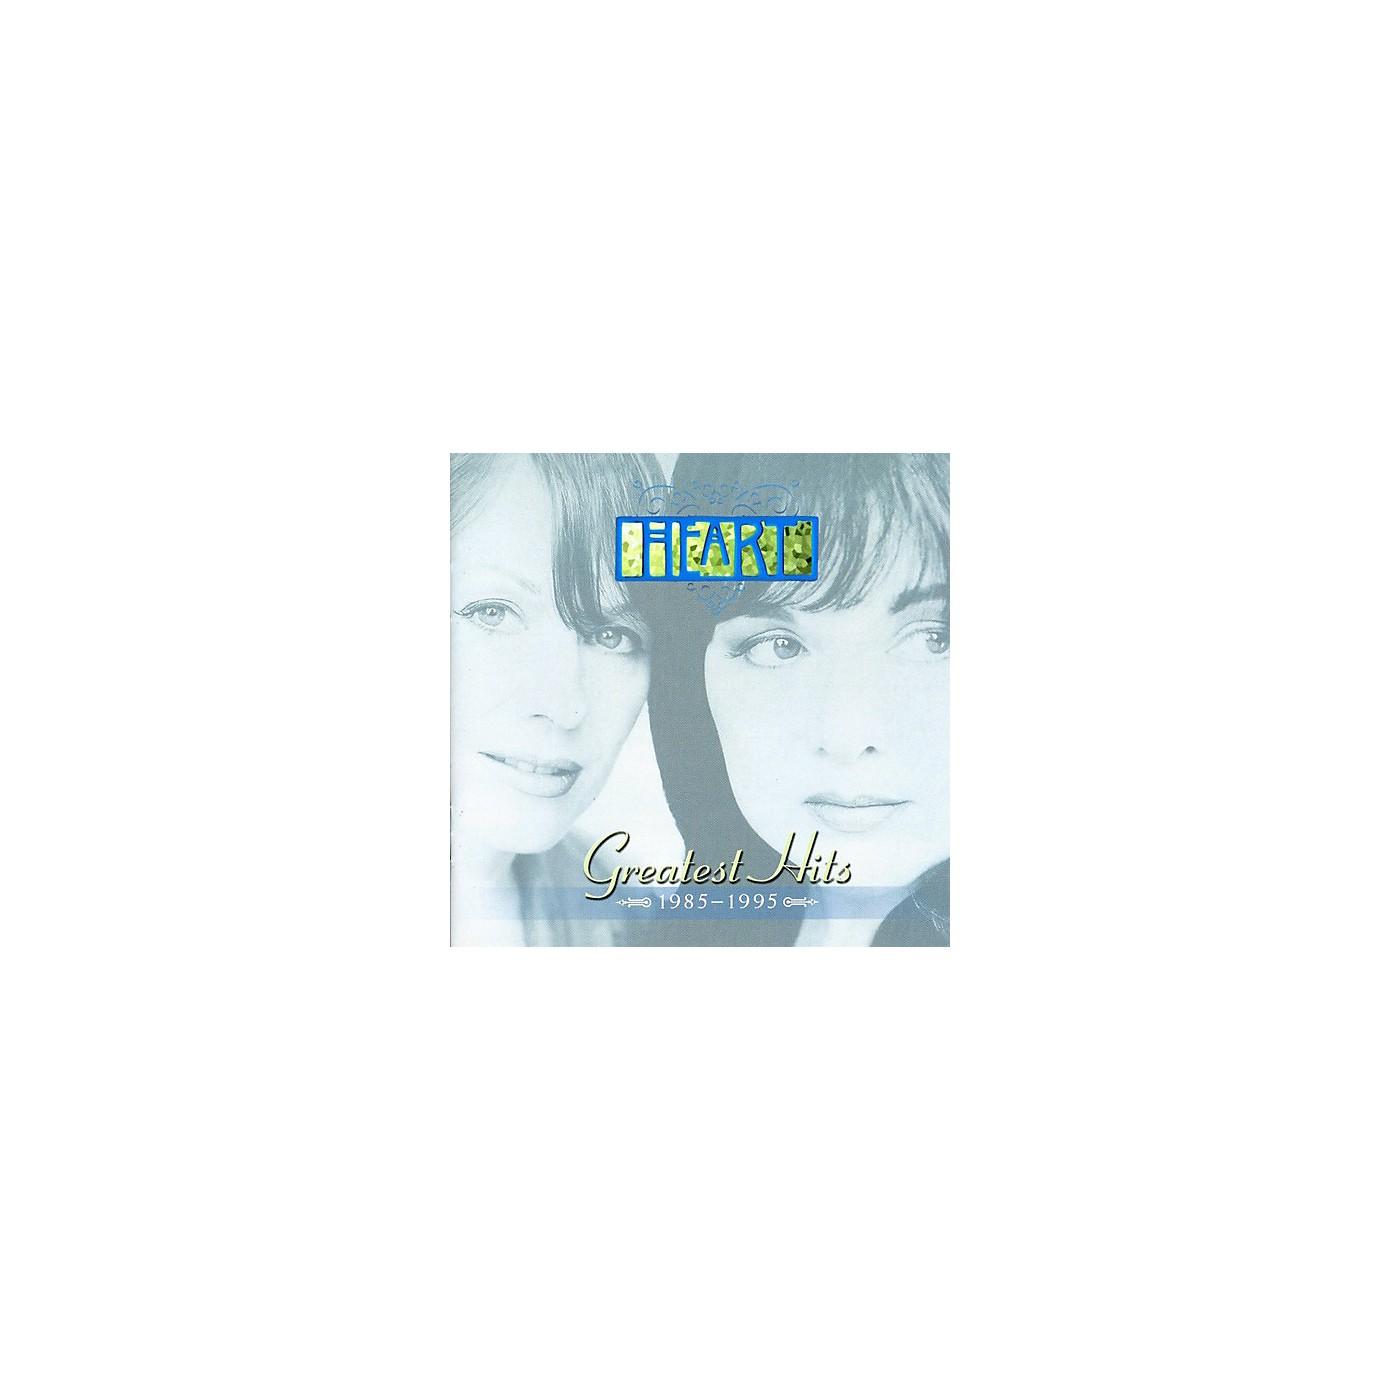 Alliance Heart - Greatest Hits 1985-1995 (CD) thumbnail